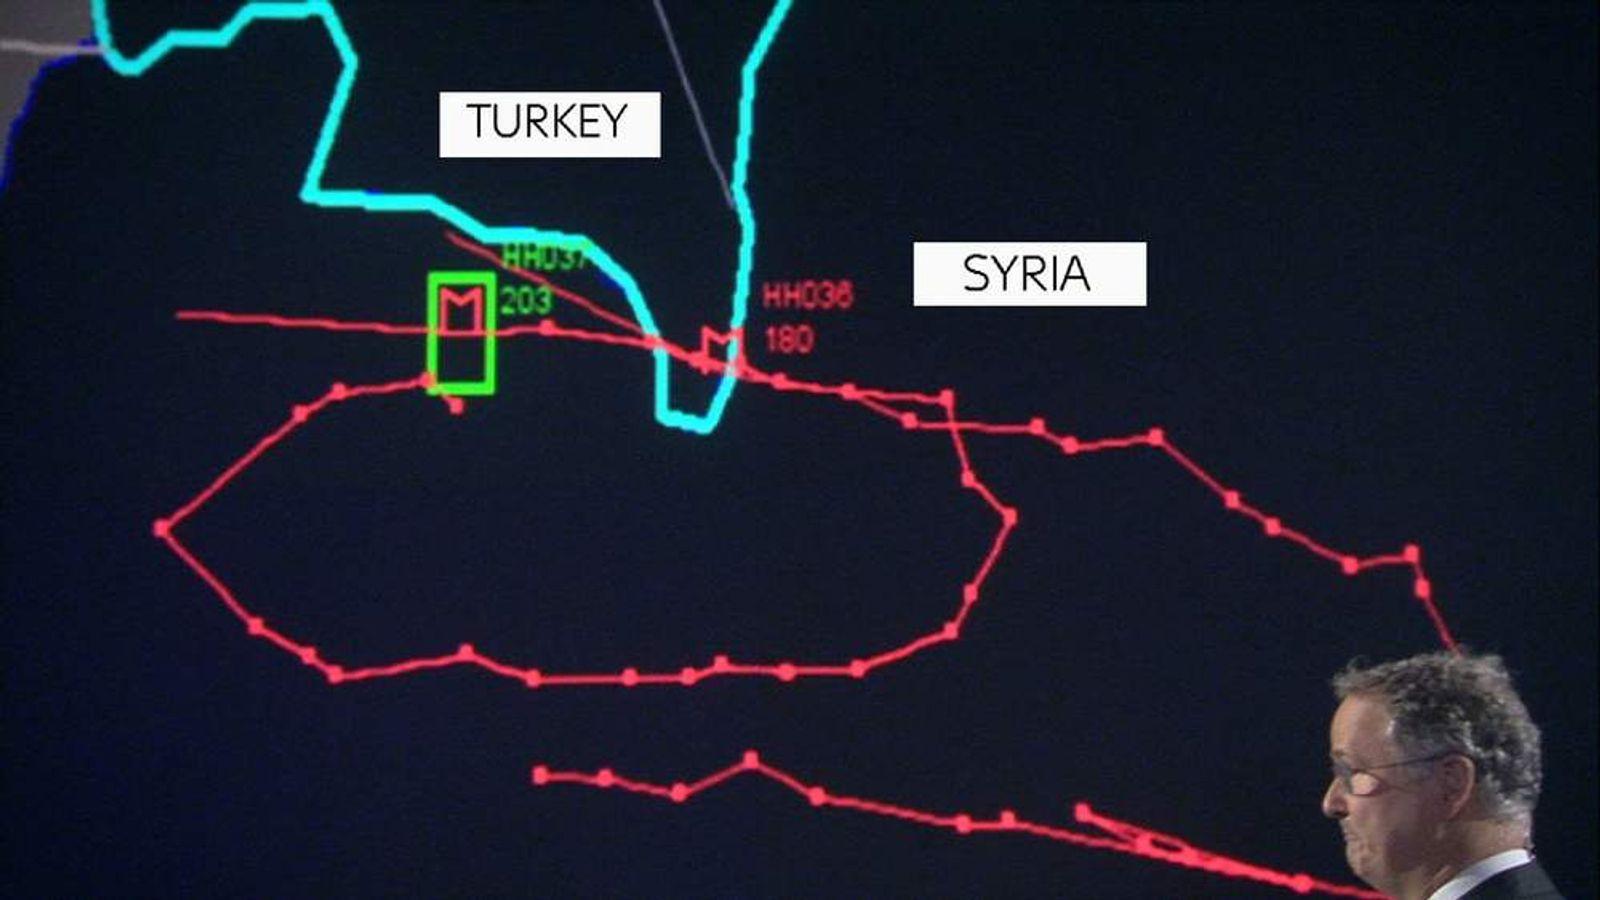 Russia jet shot down radar map